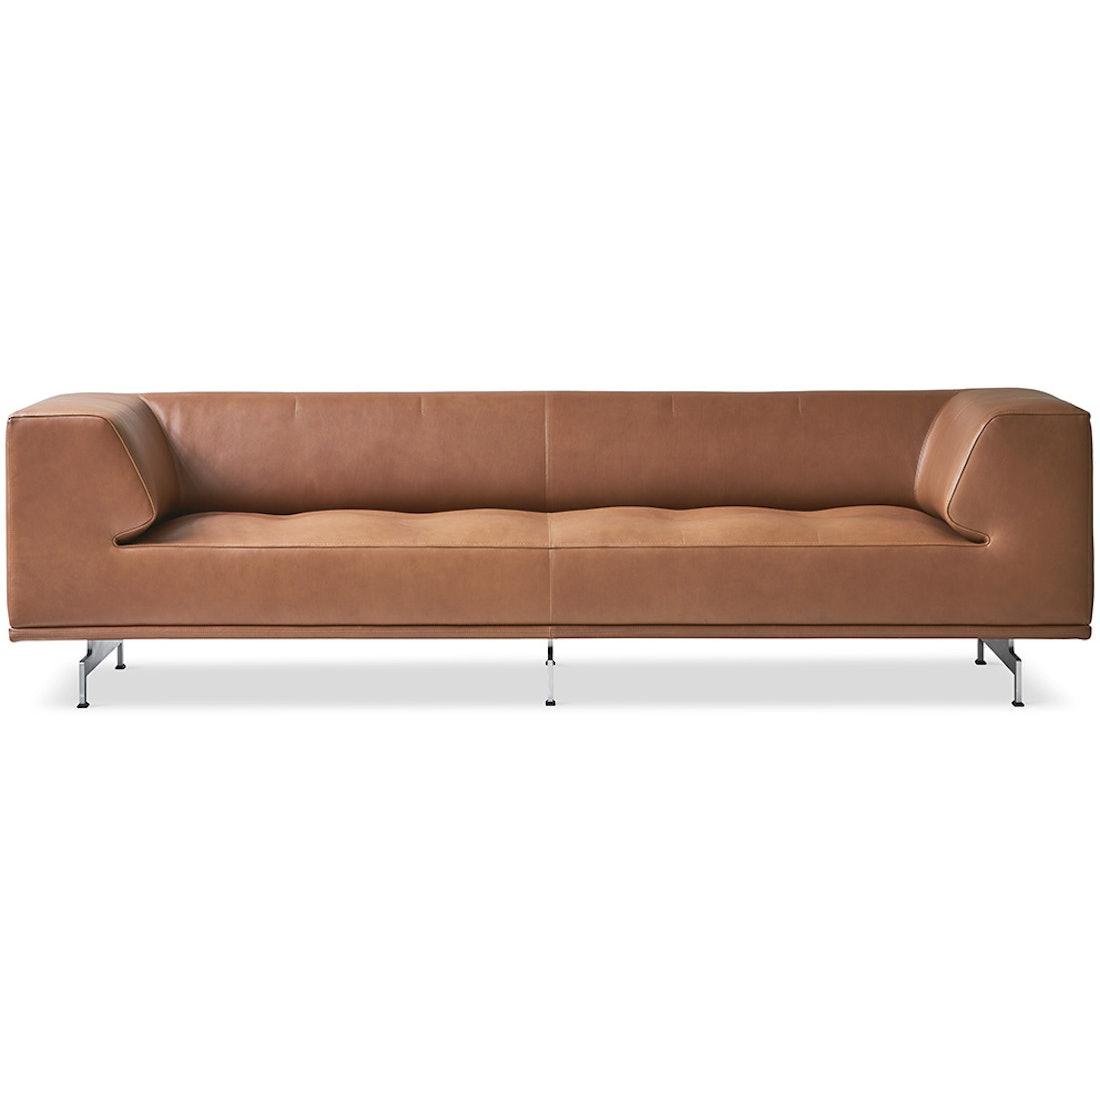 Erik Jørgensen Delphi sofa, 240 Cm, Timm Møbler